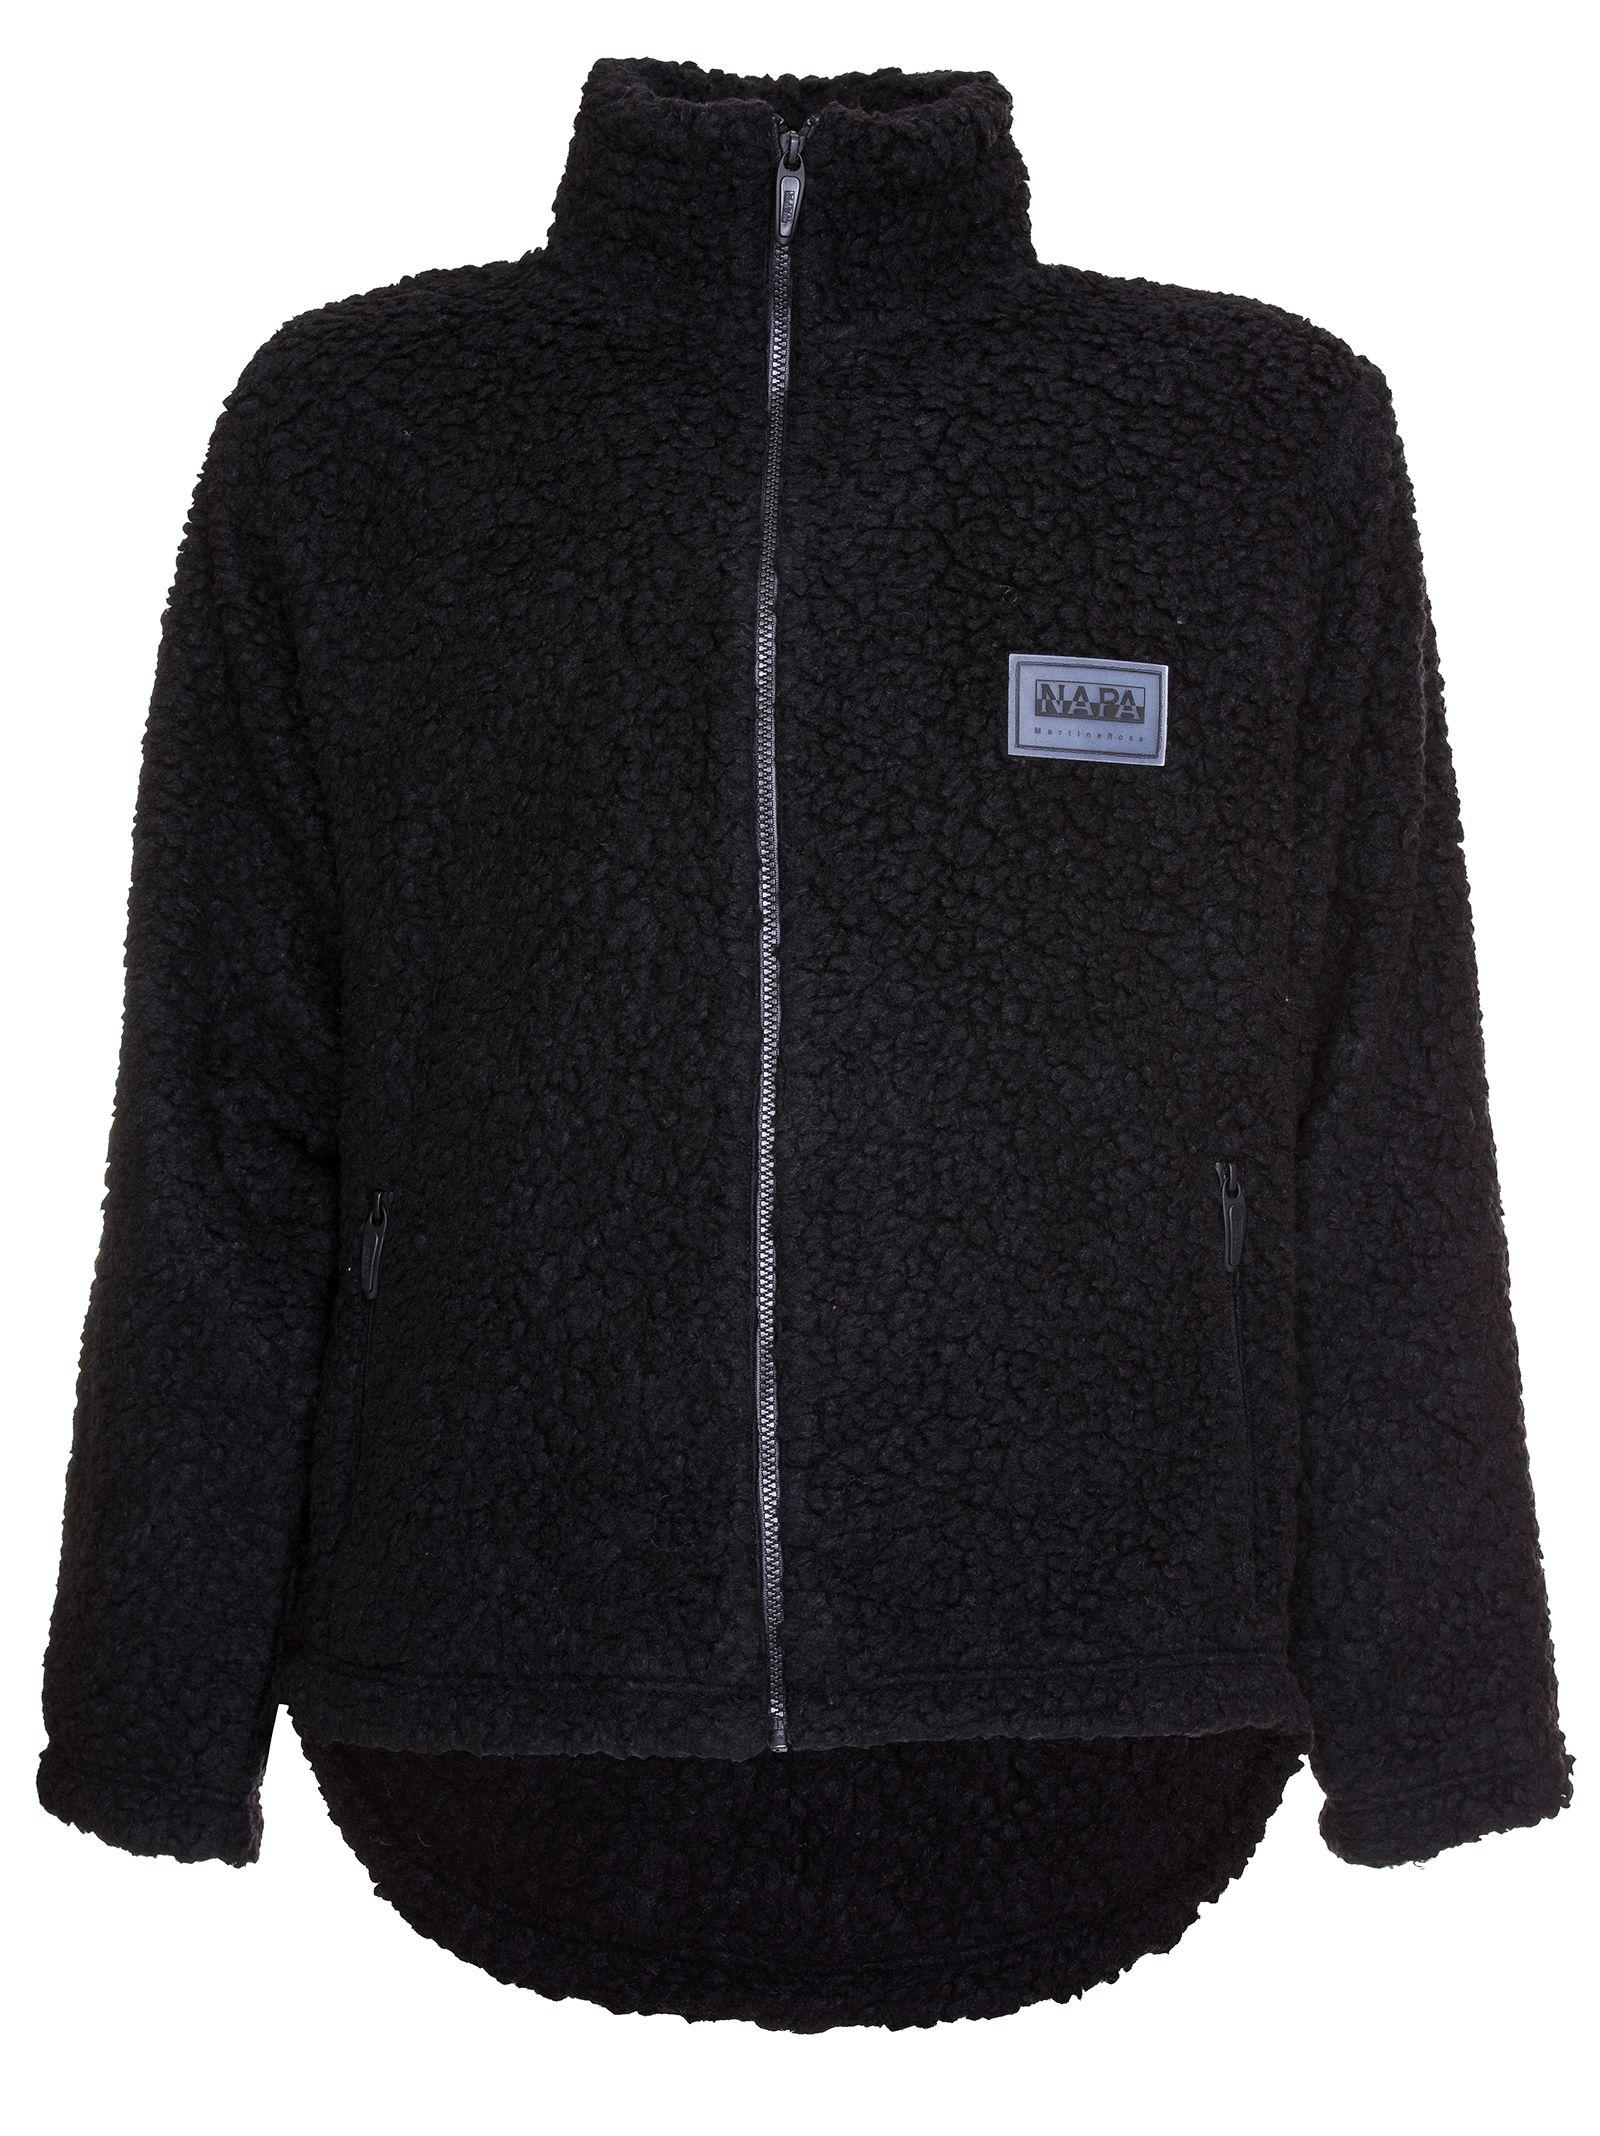 Napa By Martin Rose Sherpa Sweater, Nero